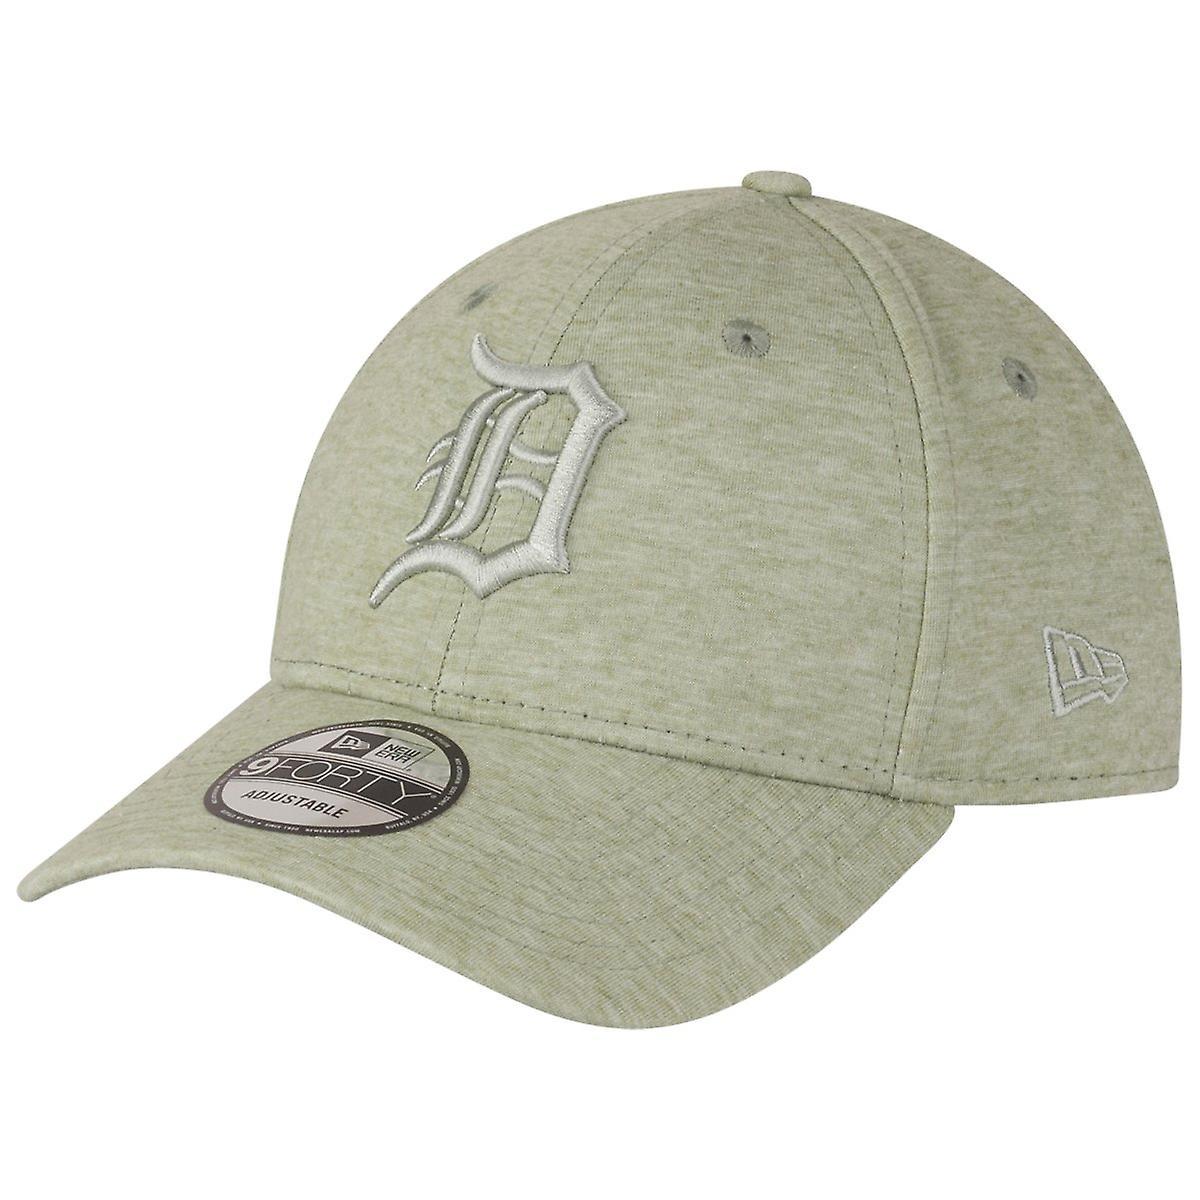 ekskluzywne oferty ograniczona guantity ogromny zapas New era Cap - 9Forty JERSEY Detroit Tigers bright mint